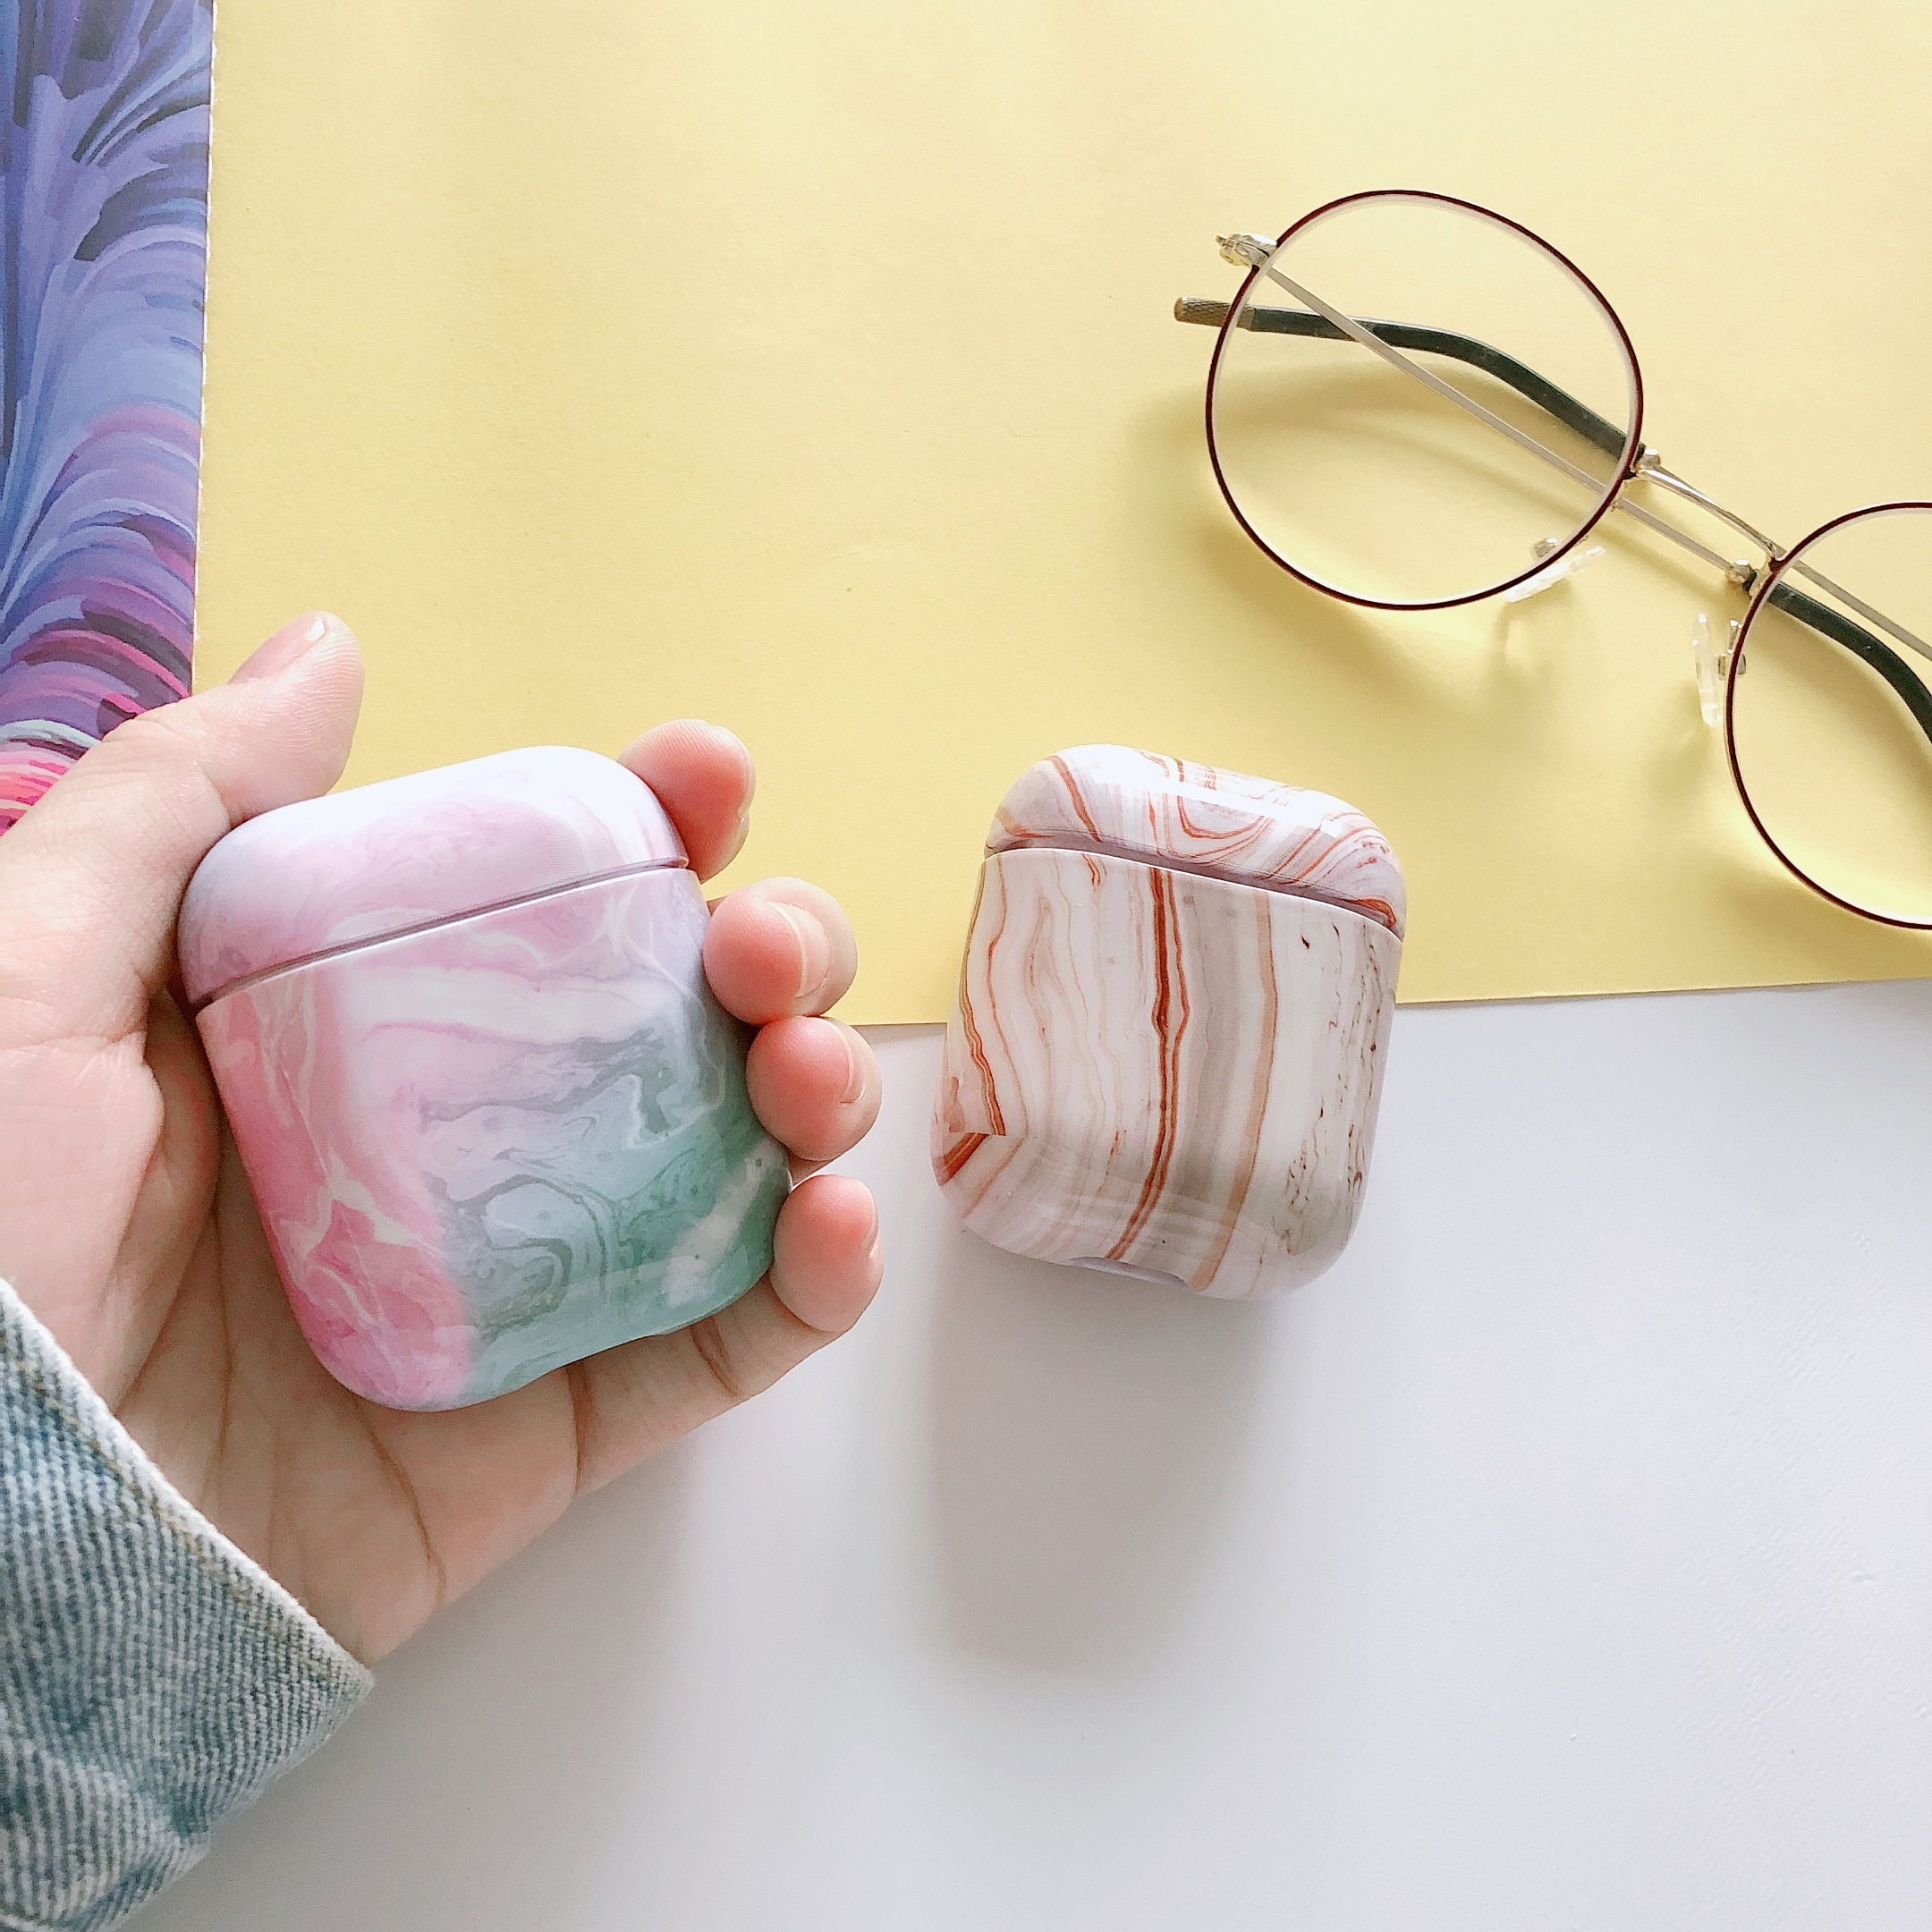 10 unids/set funda para Airpod 1 o Airpods 2 funda protectora de mármol de lujo 11 auricular Bluetooth caja de carga piel protectora